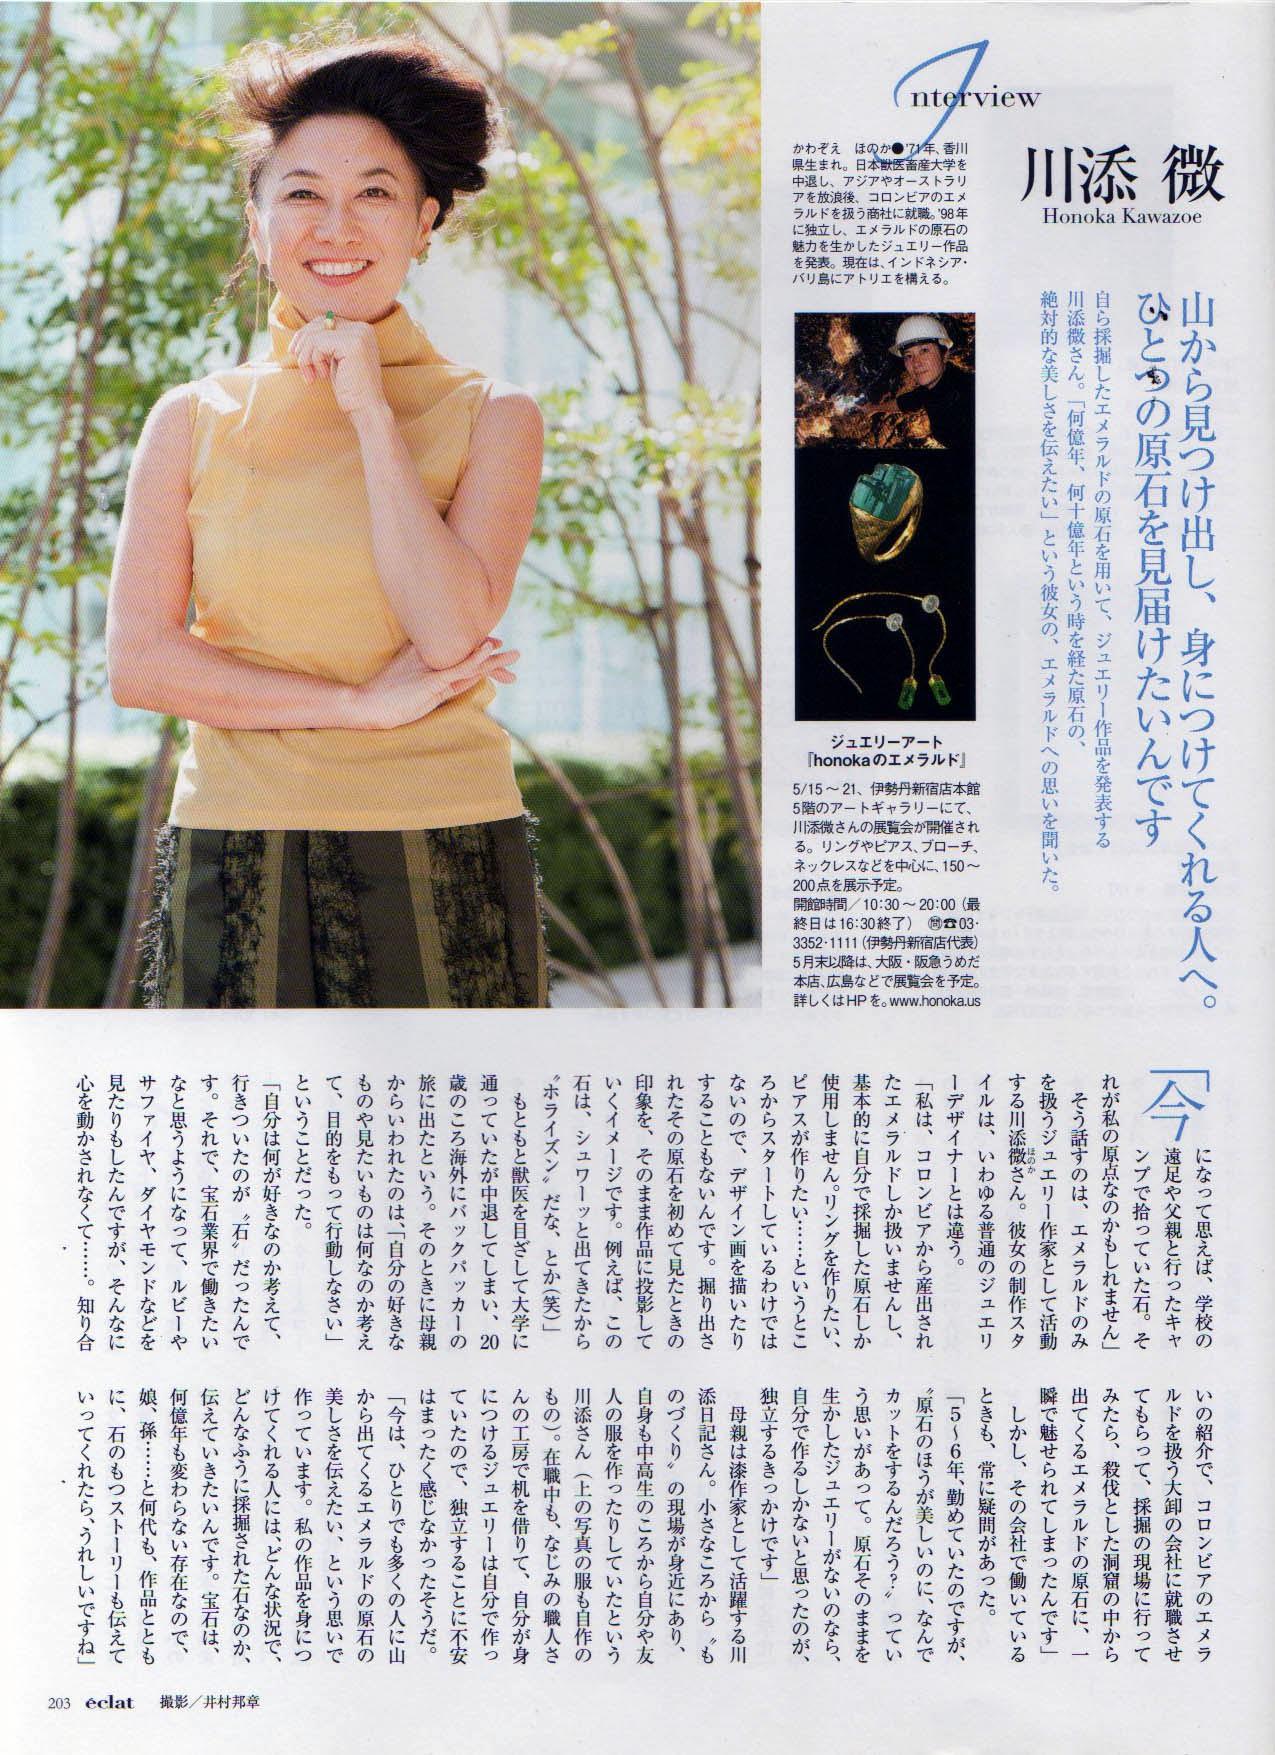 Honoka Interview 14 Yomiuri Newspaper